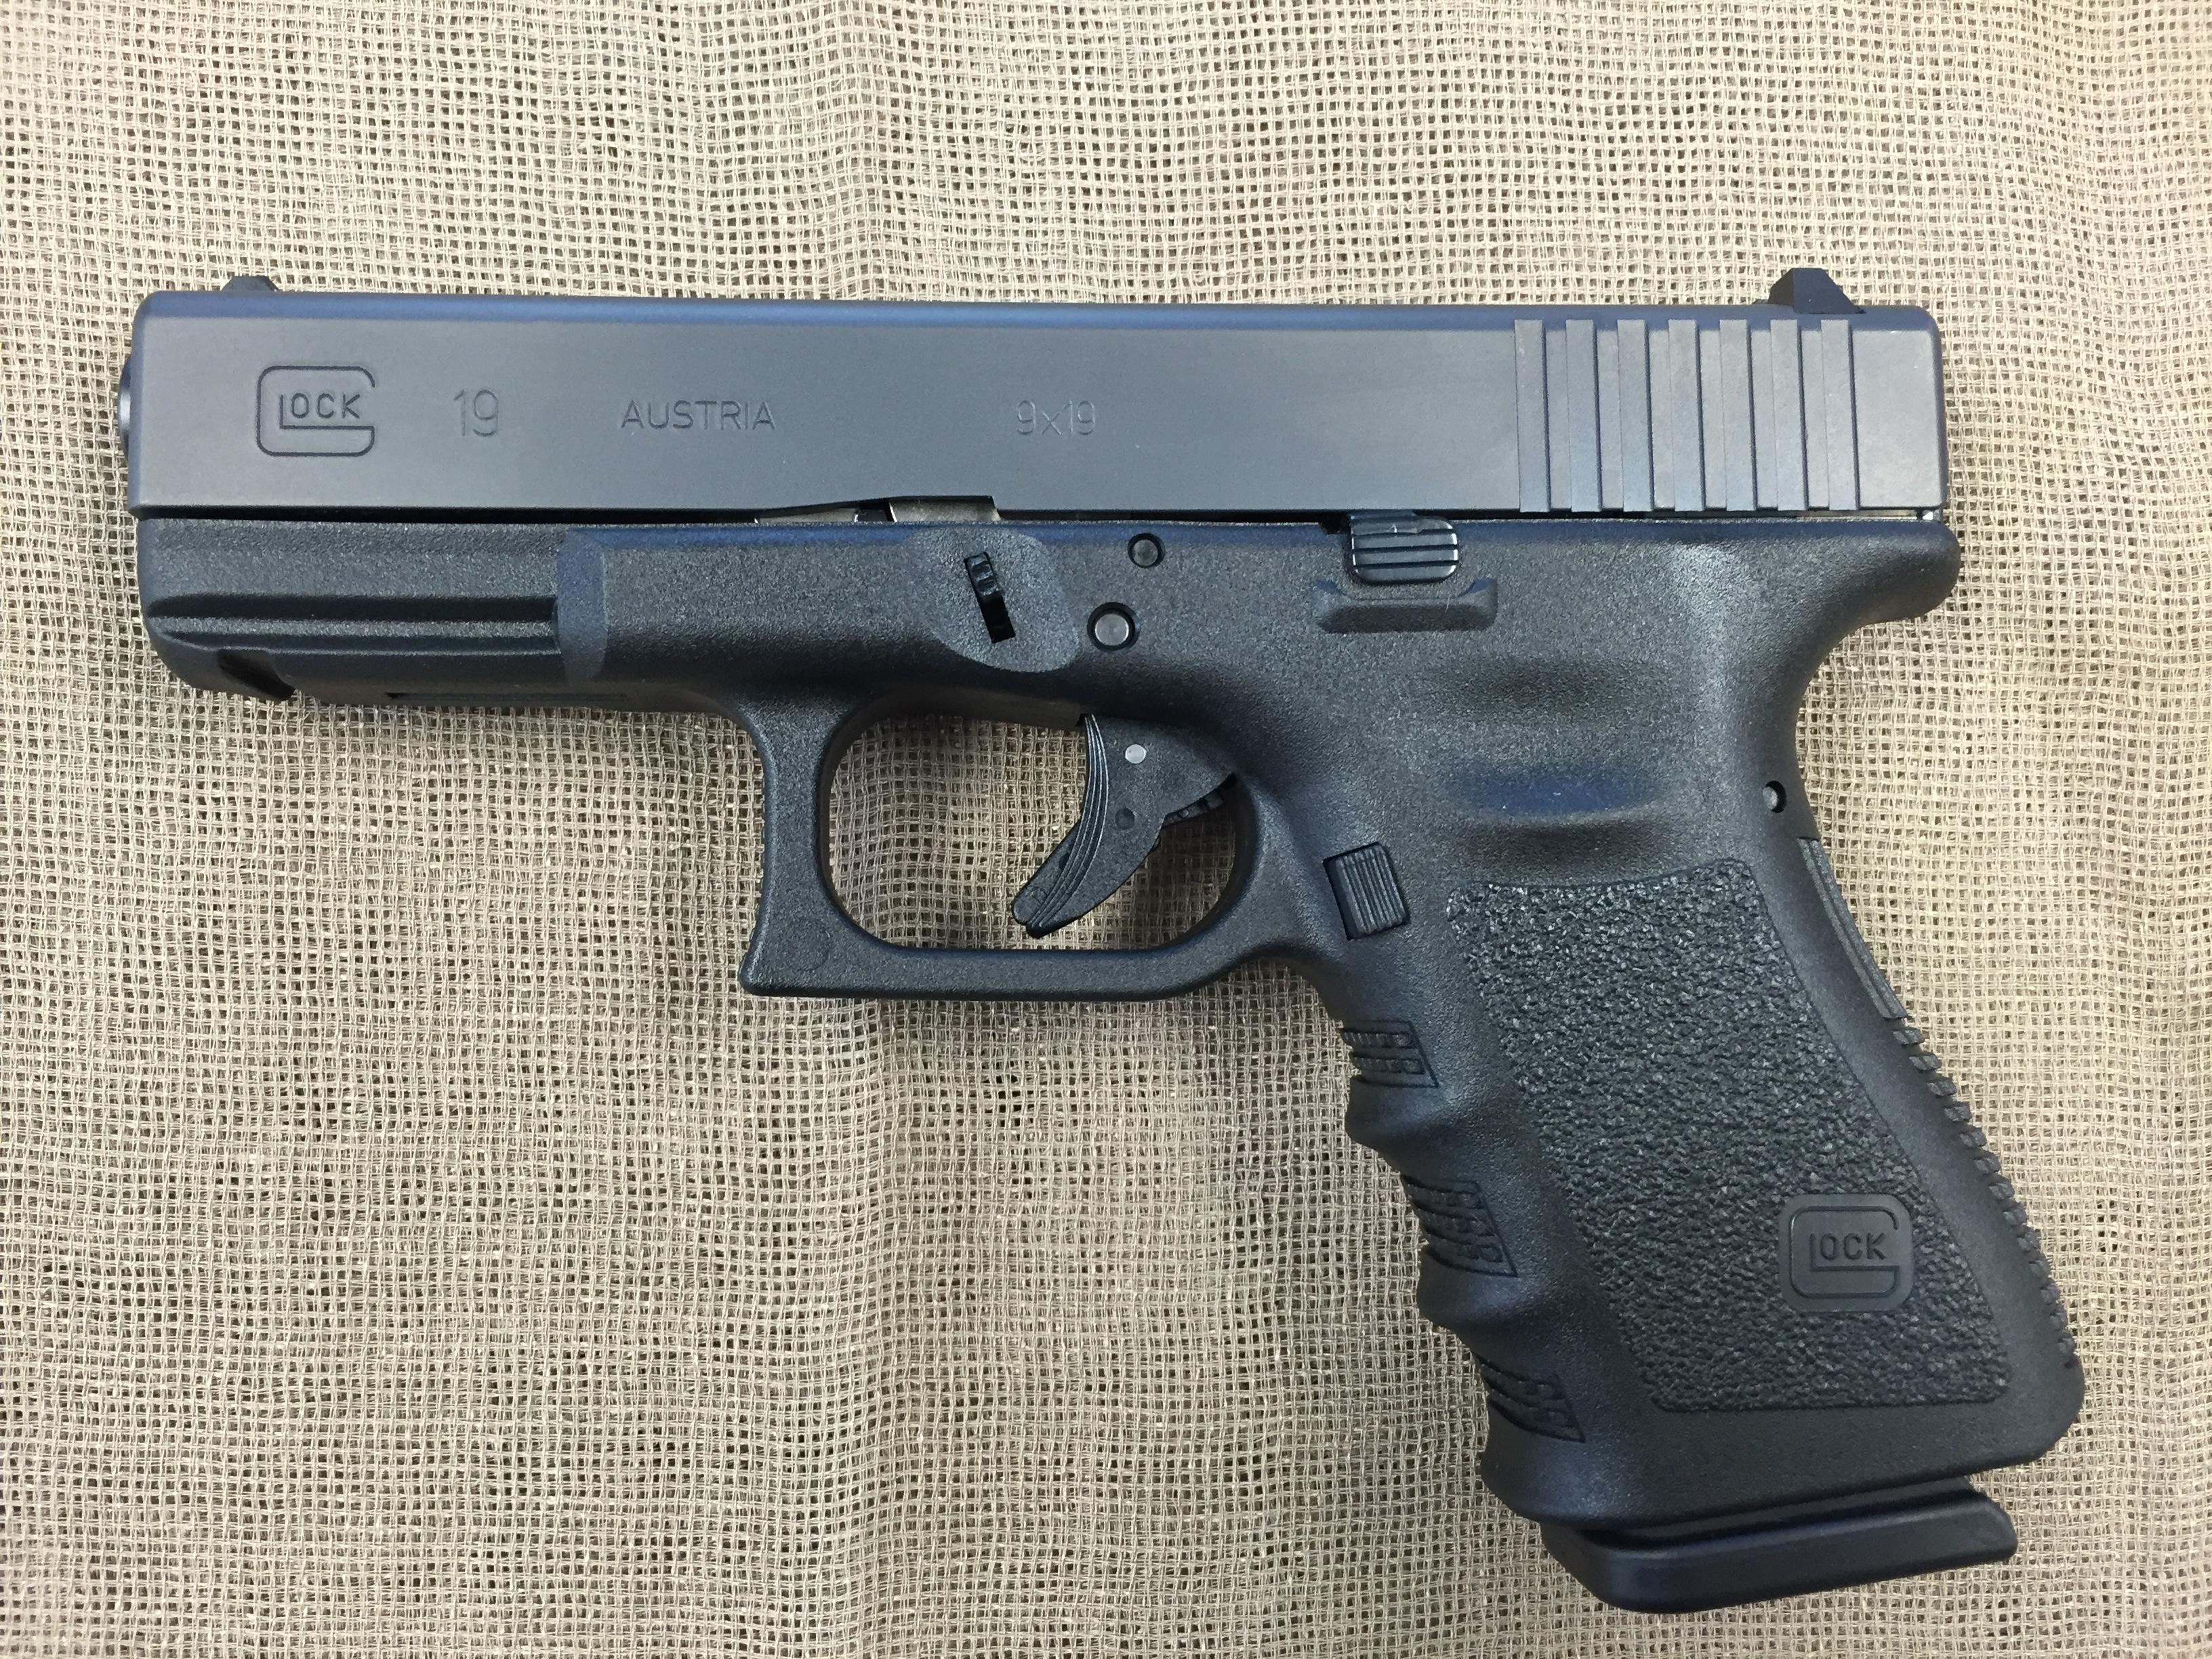 Glock Model 19 9mm auto – Saddle Rock Armory